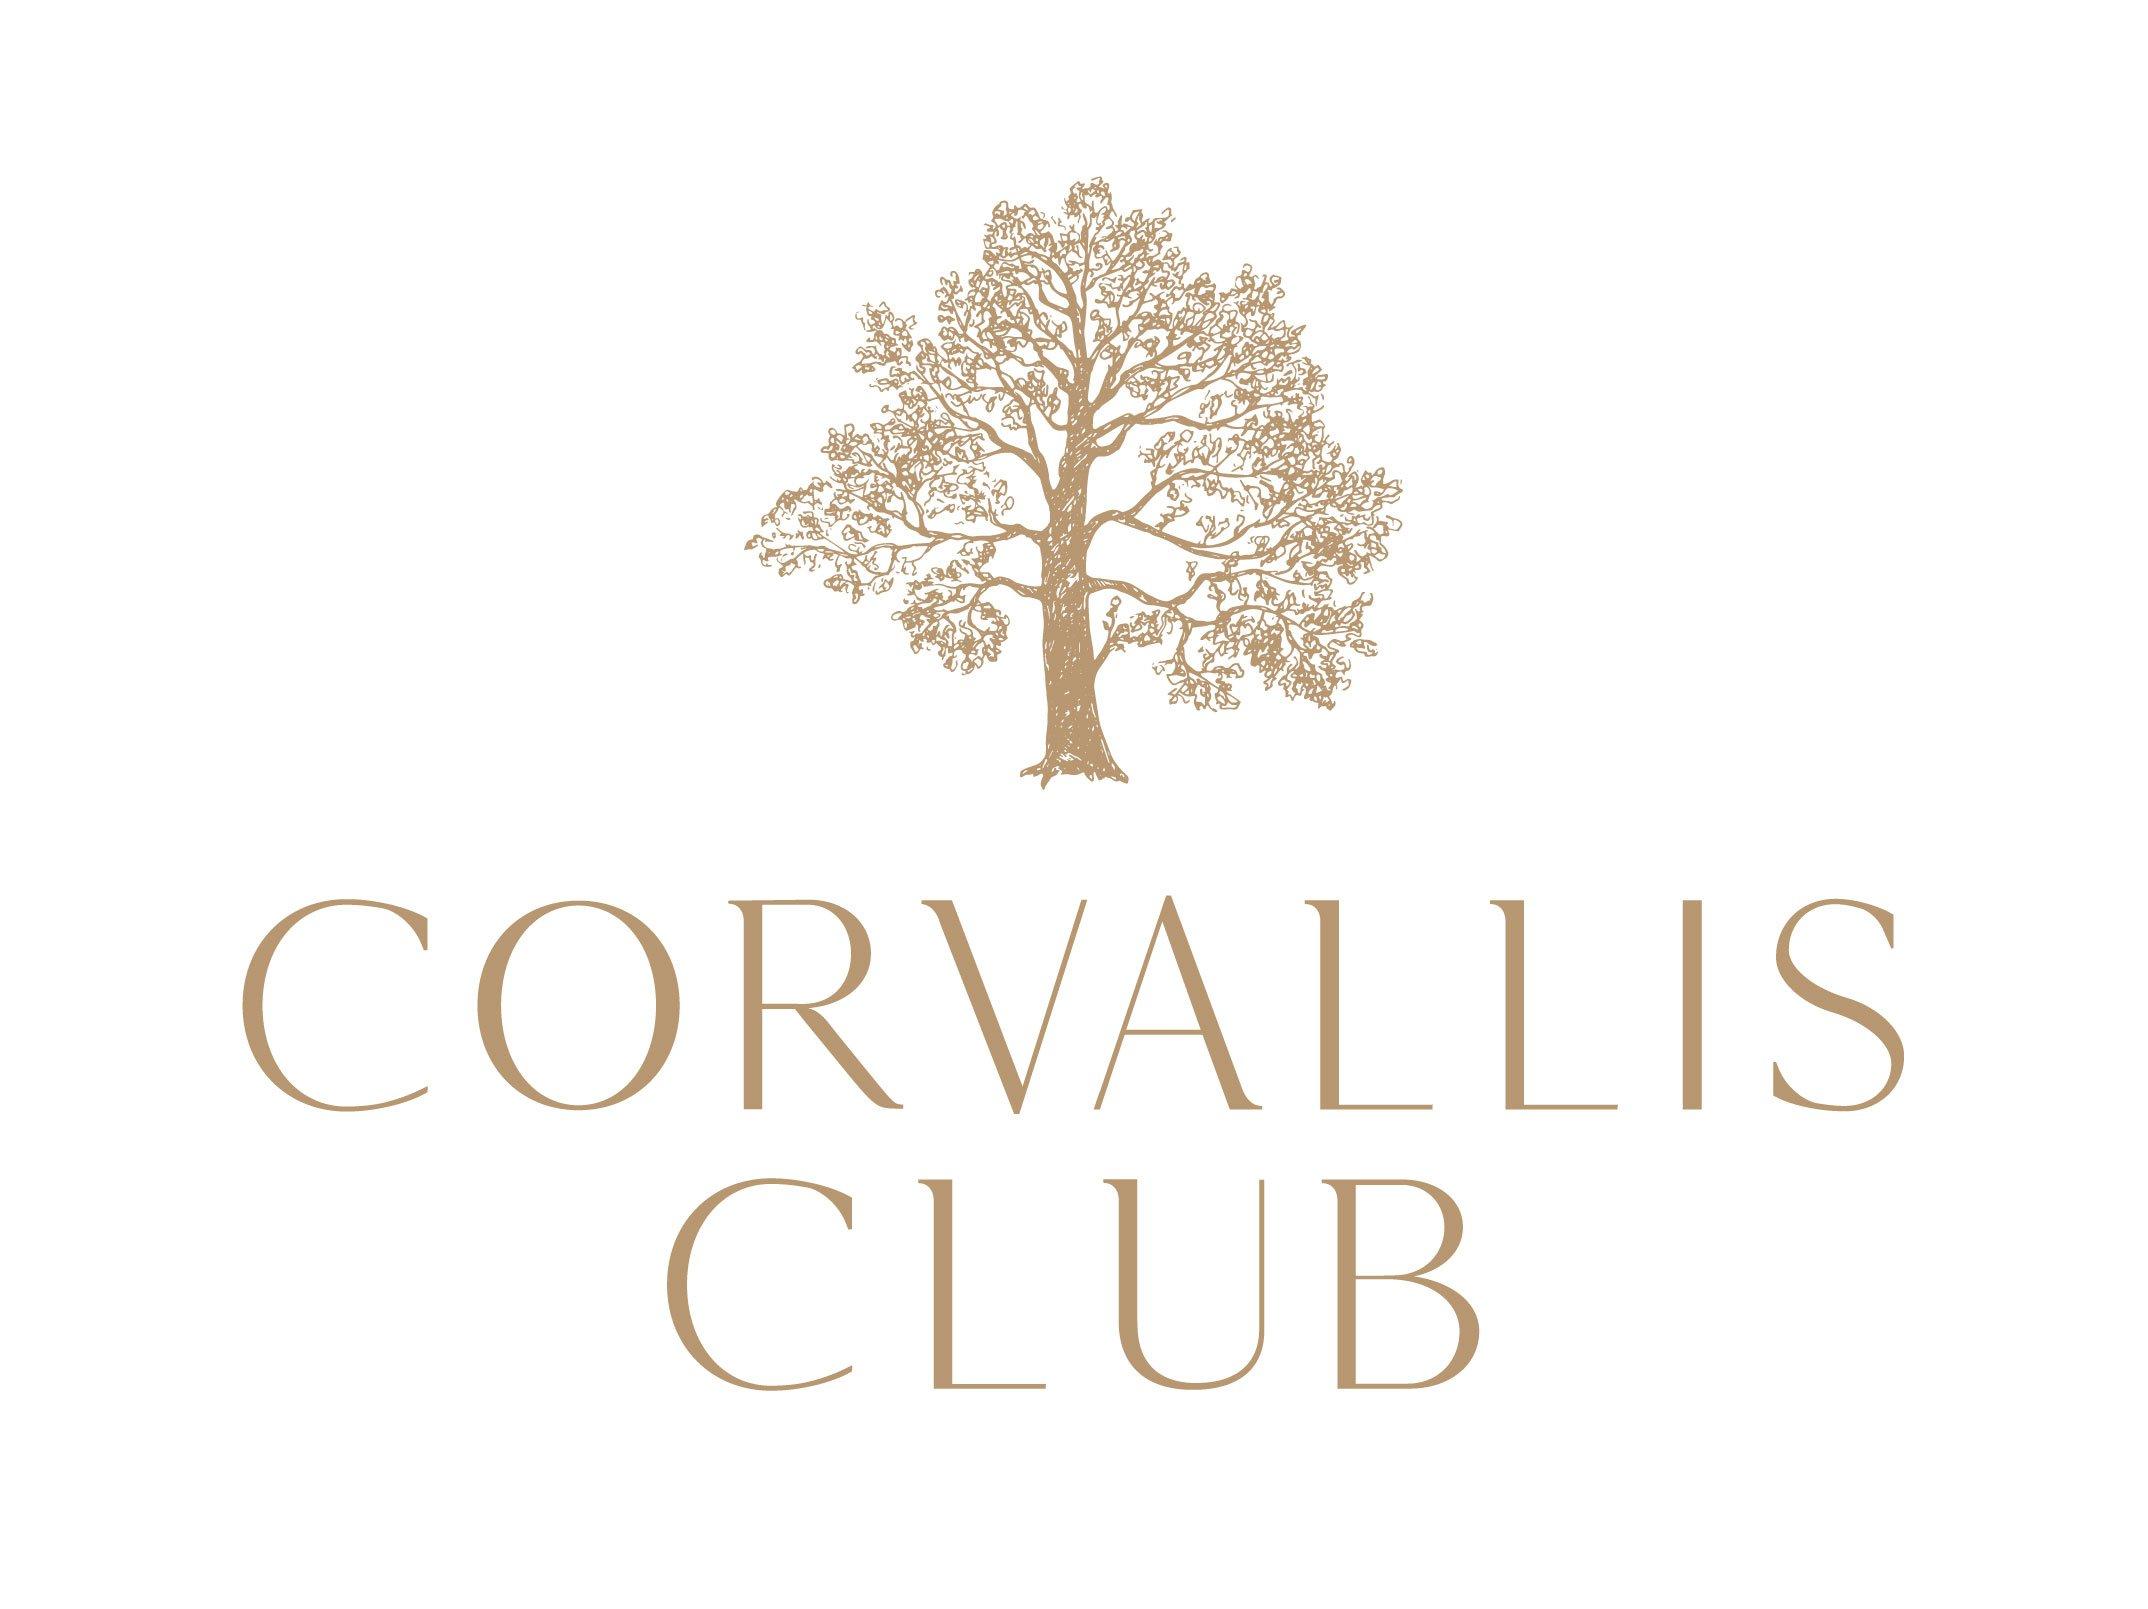 Corvallis Club